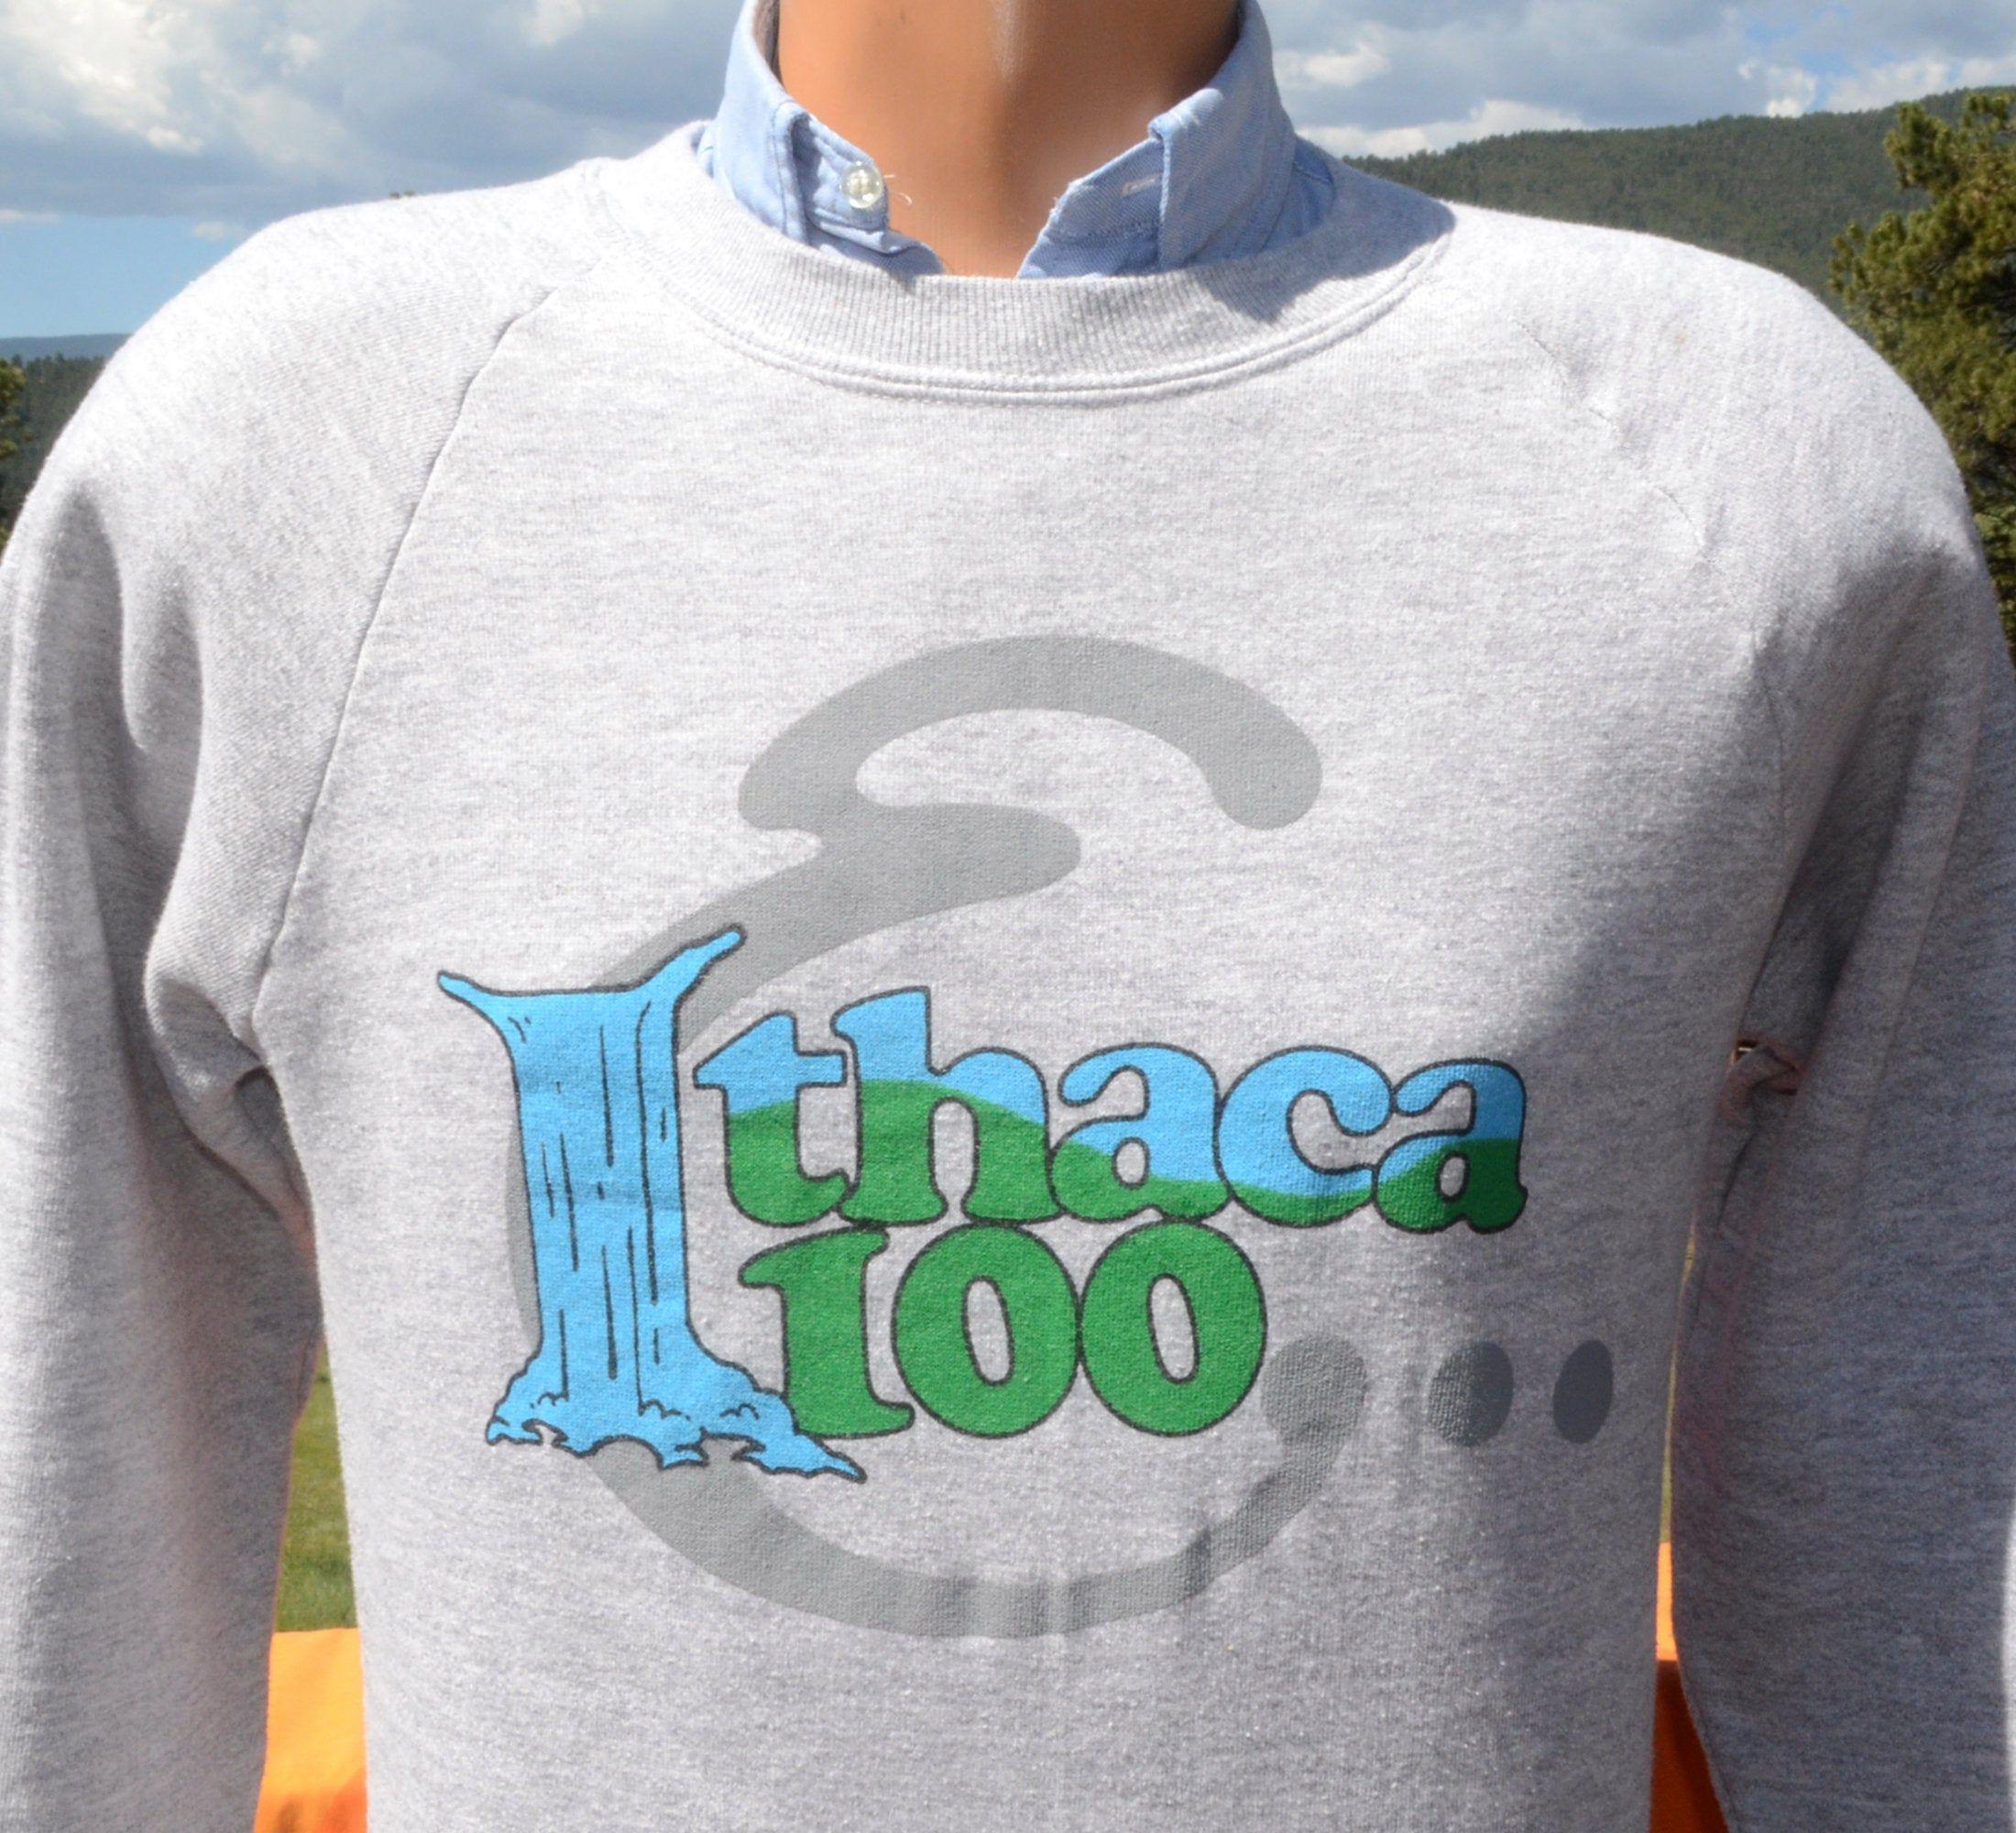 vintage 80s sweatshirt ITHACA new york 100 crewneck